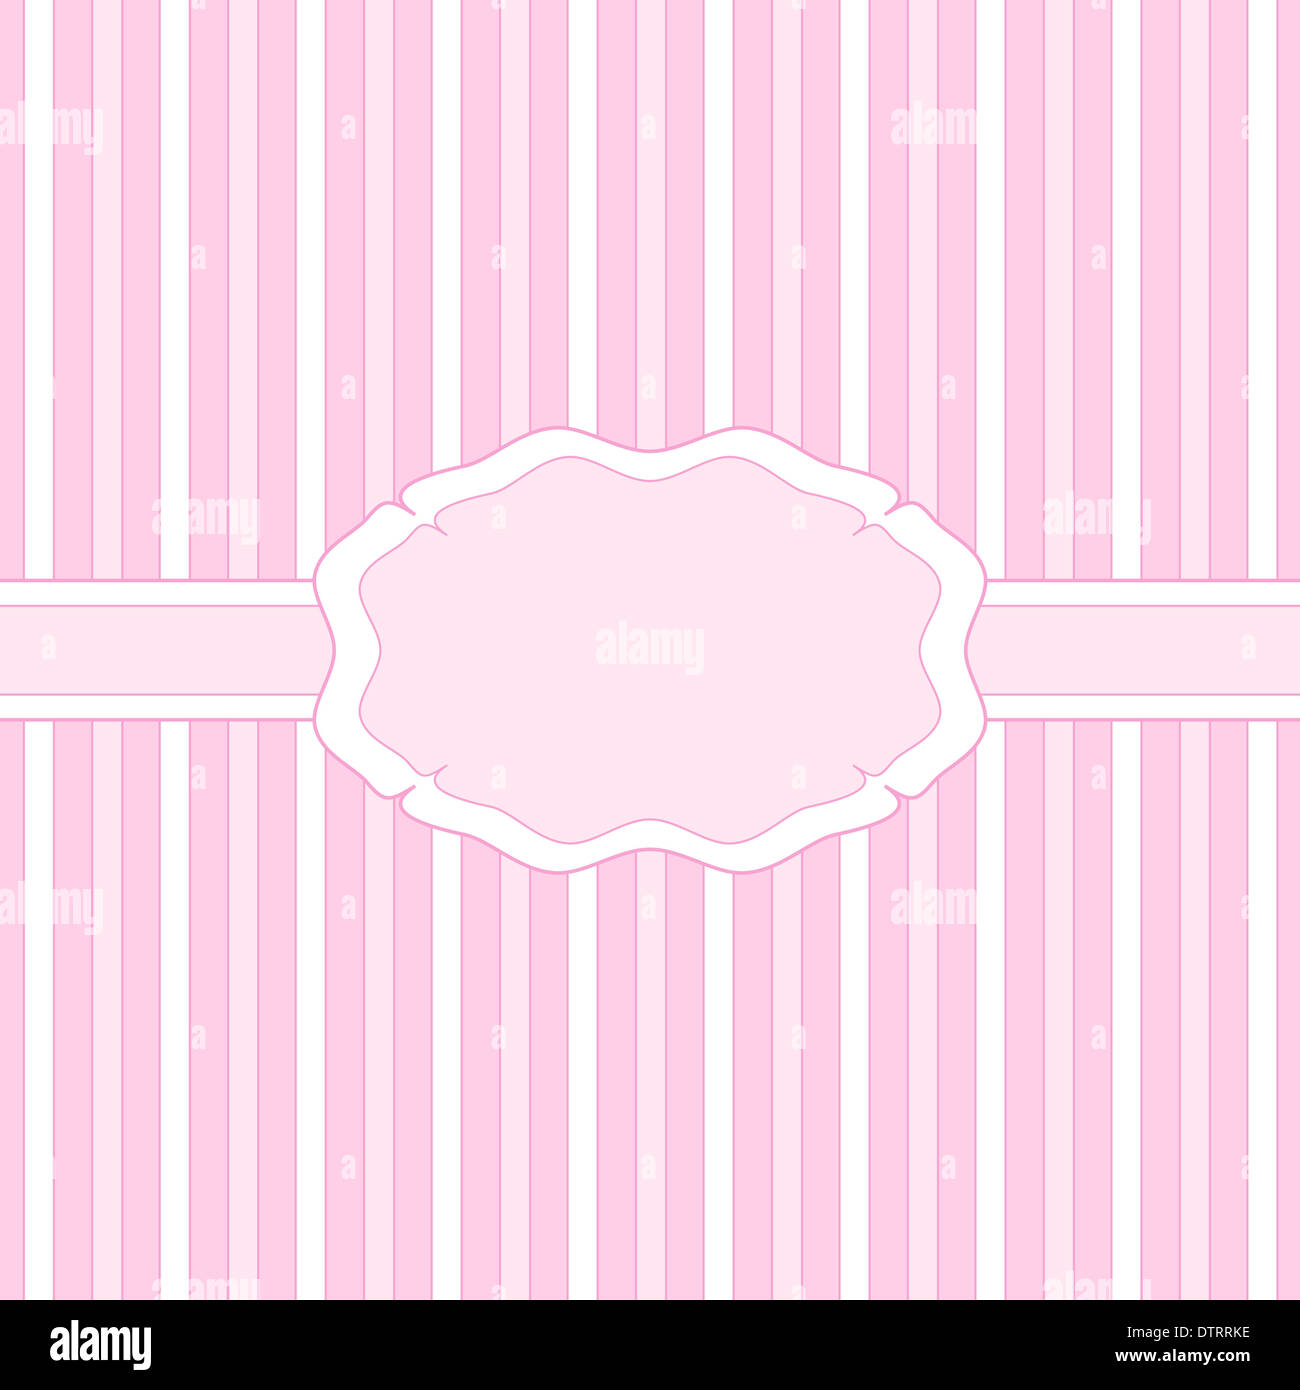 Pink banner design on stripes Stock Photo